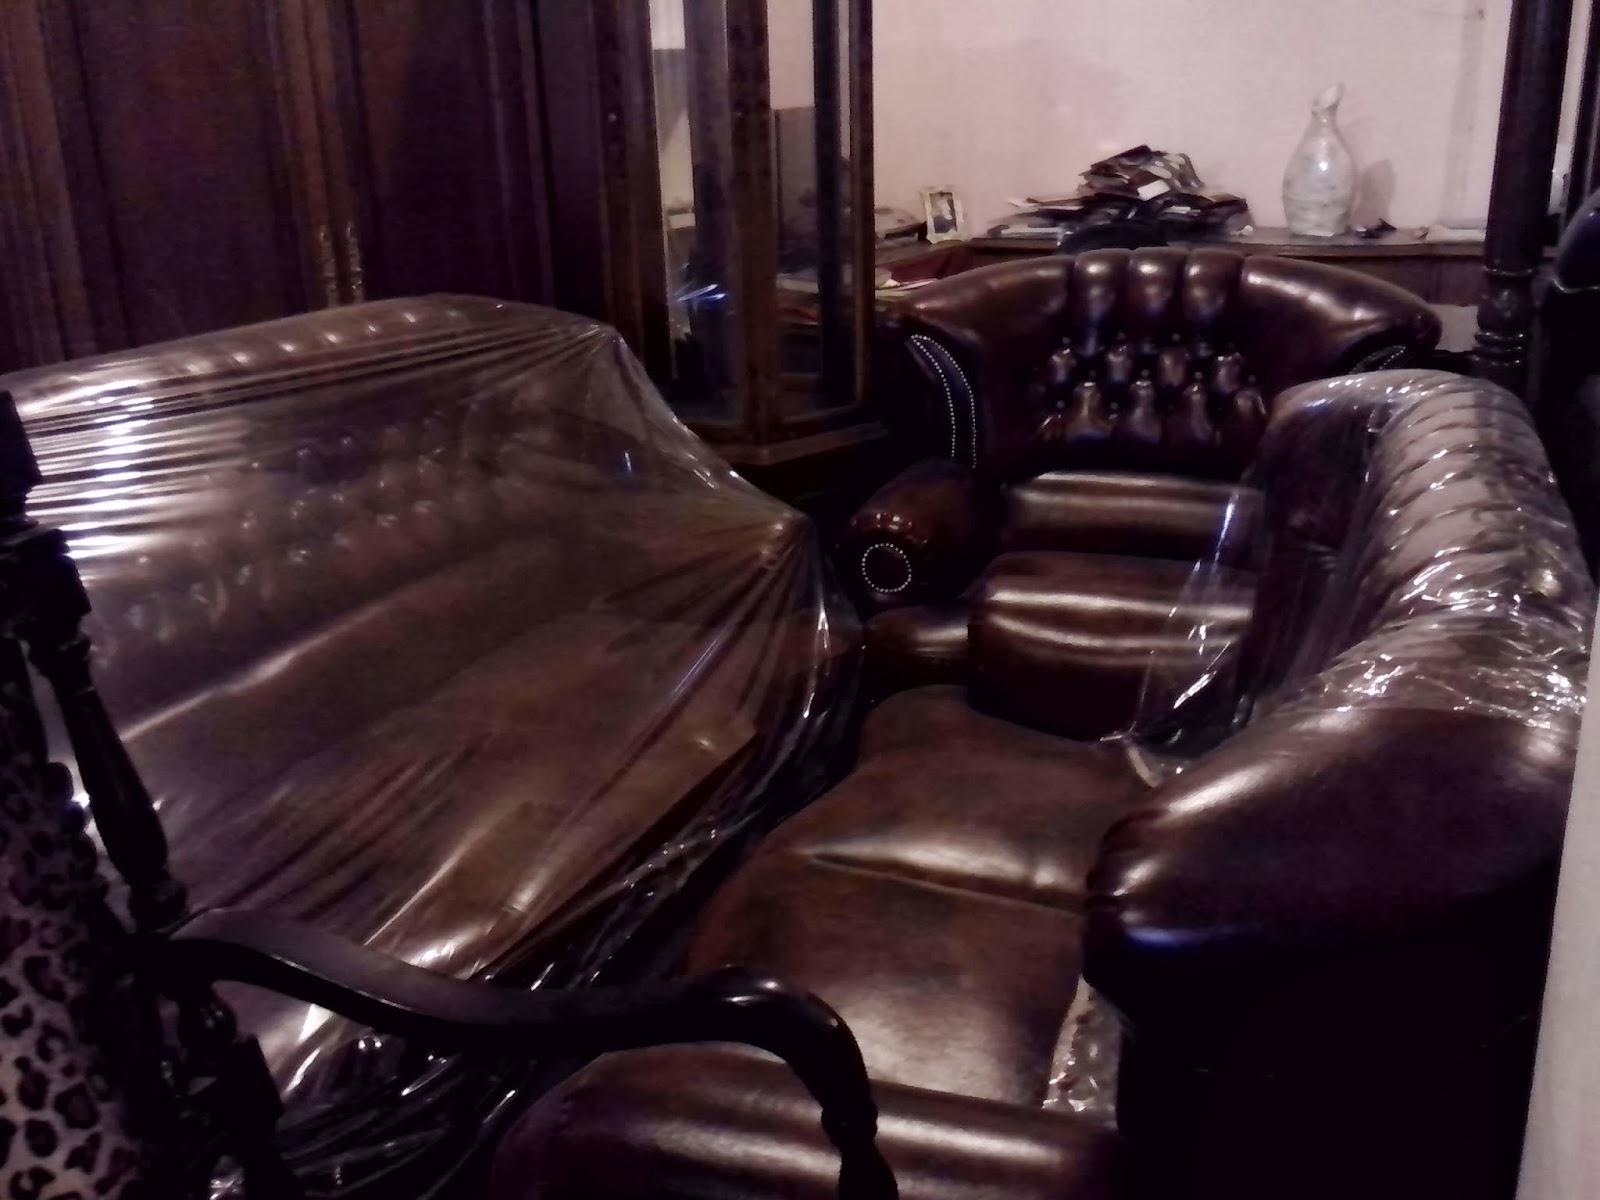 Furniture Jati Minimalis di Bandung Paling Keren